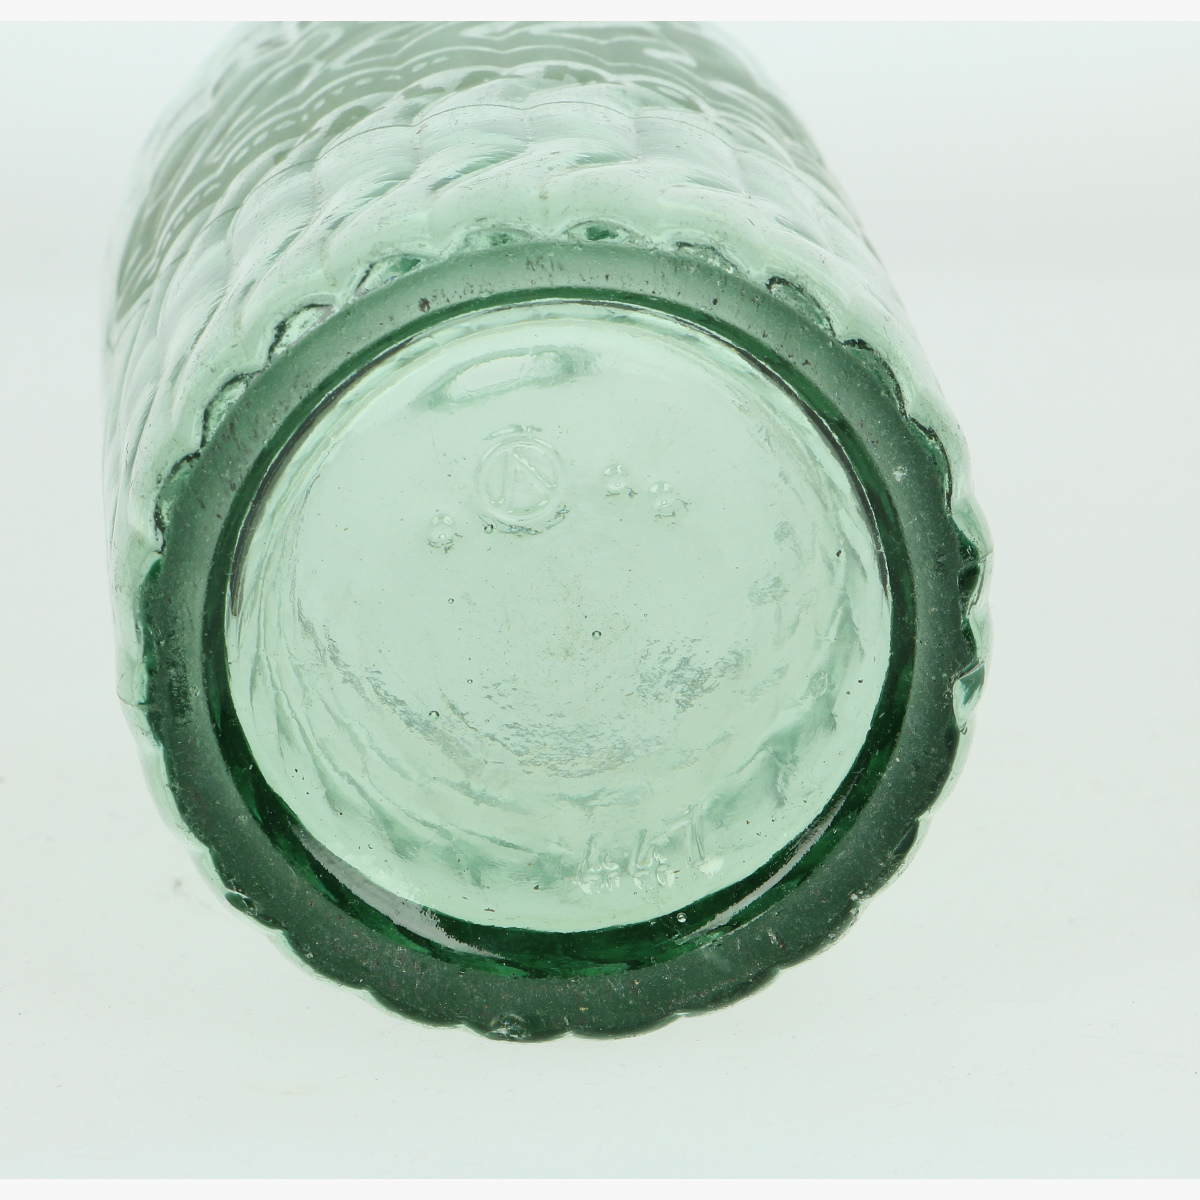 Afbeeldingen van oude soda fles espumosos bertrán palamos